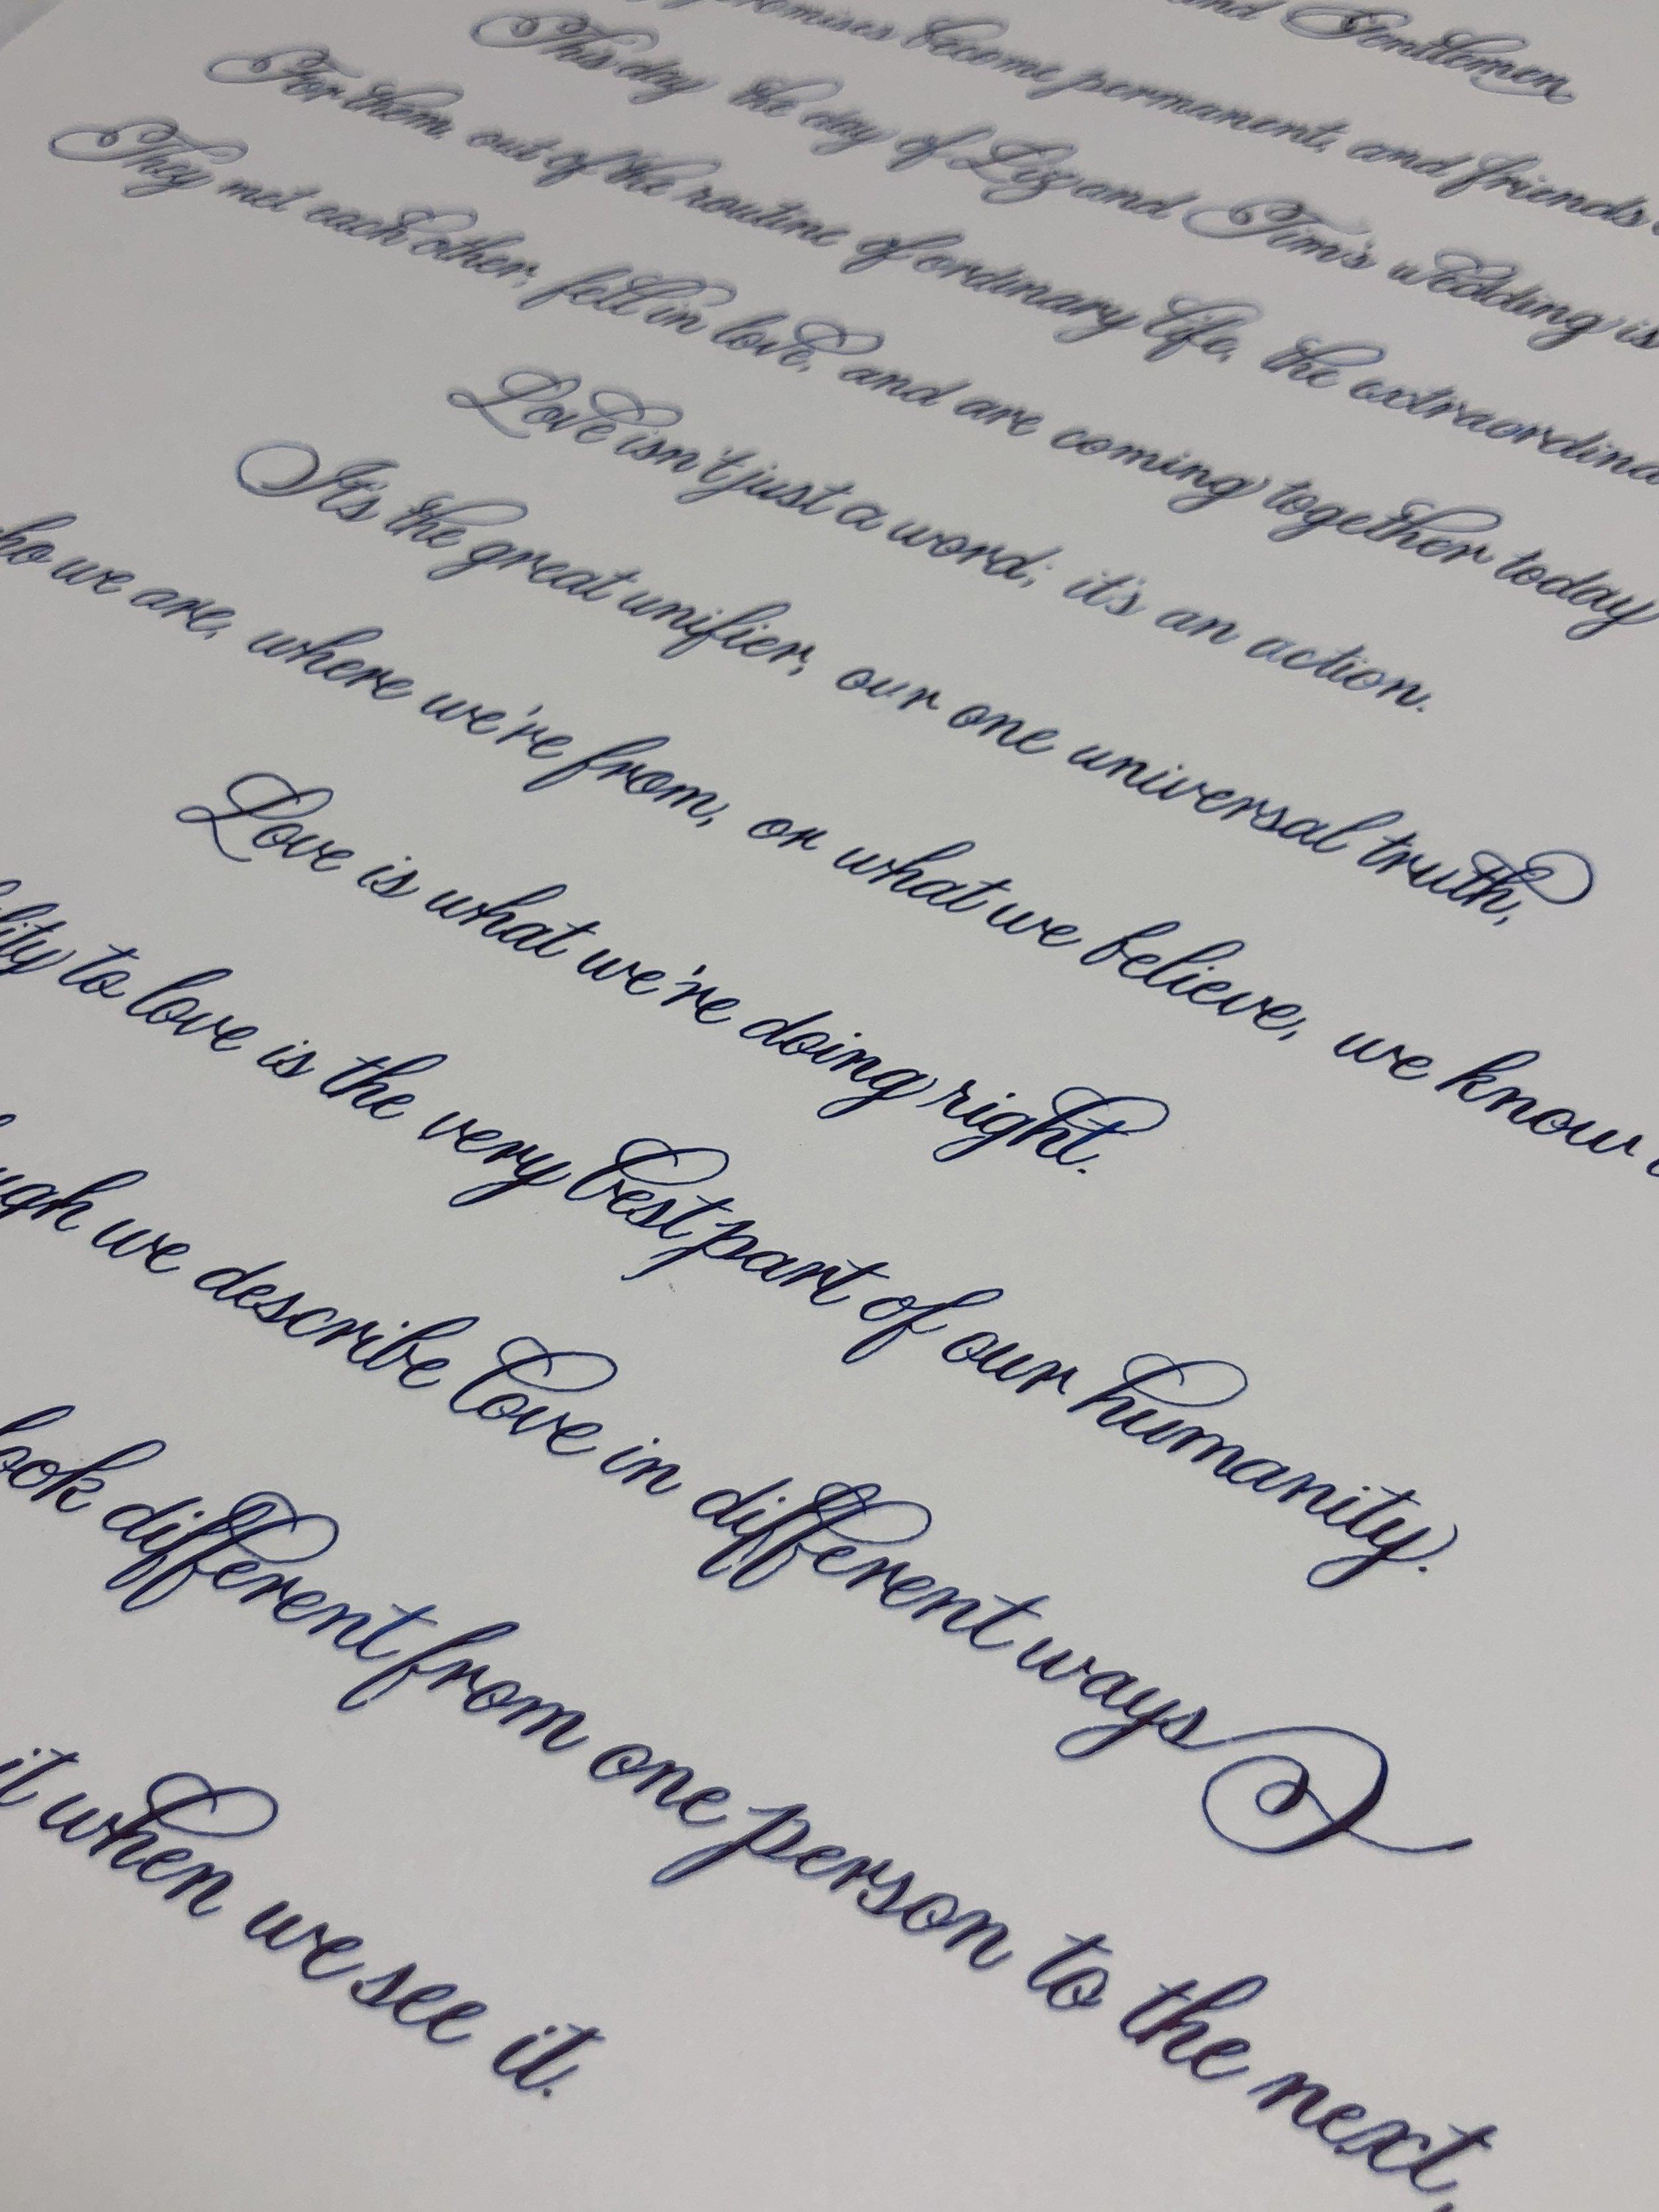 Central PA, York PA, JesSmith Designs, custom, wedding, invitations, bridal, Harrisburg, hanover, calligraphy, baltimore, wedding invitations, lancaster, gettysburg, 07-10 05.46.54.jpg